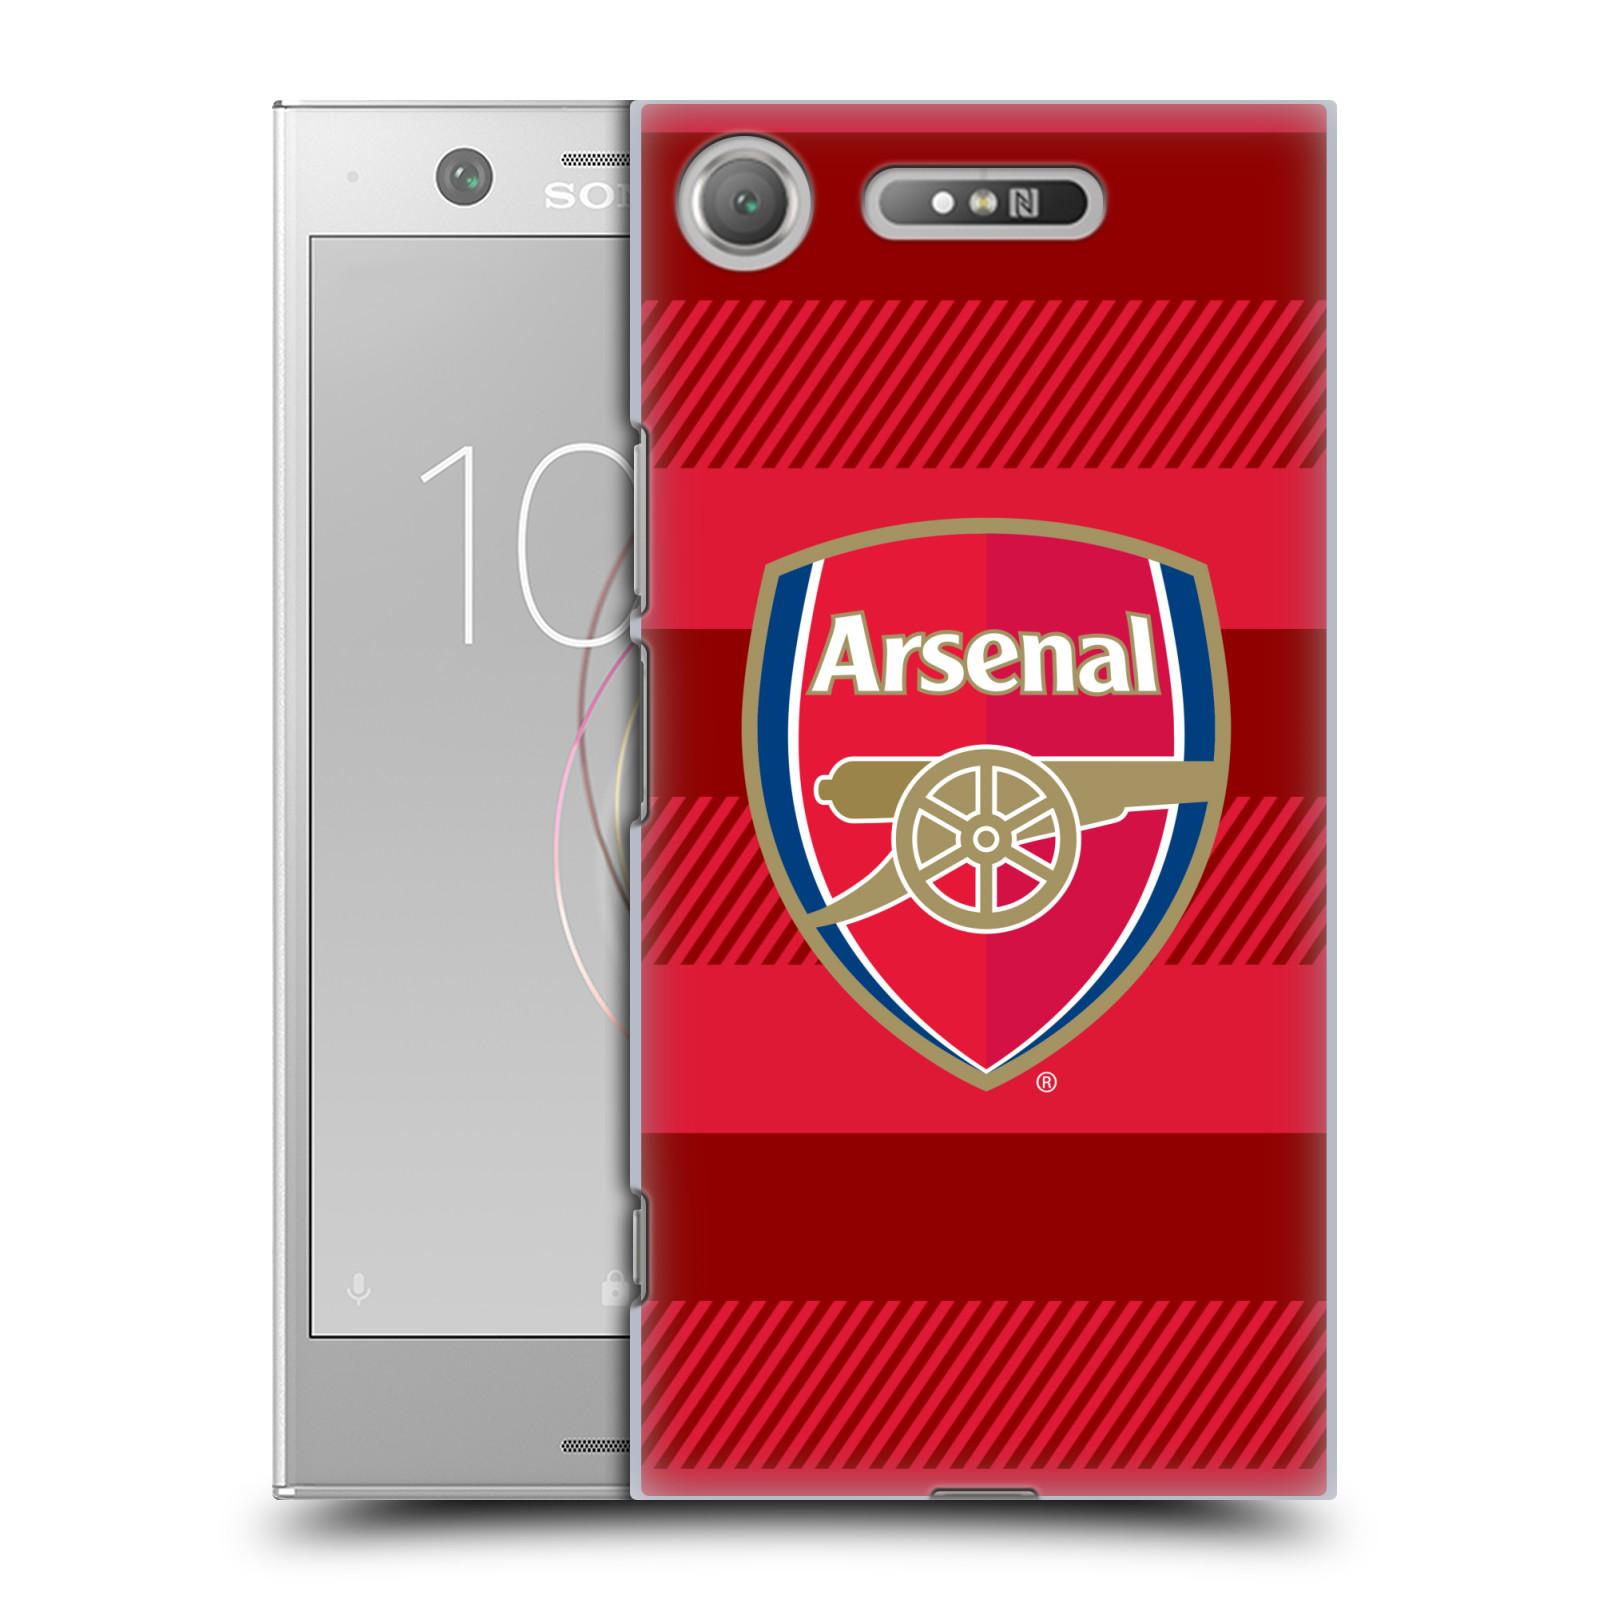 Plastové pouzdro na mobil Sony Xperia XZ1 - Head Case - Arsenal FC - Logo s pruhy